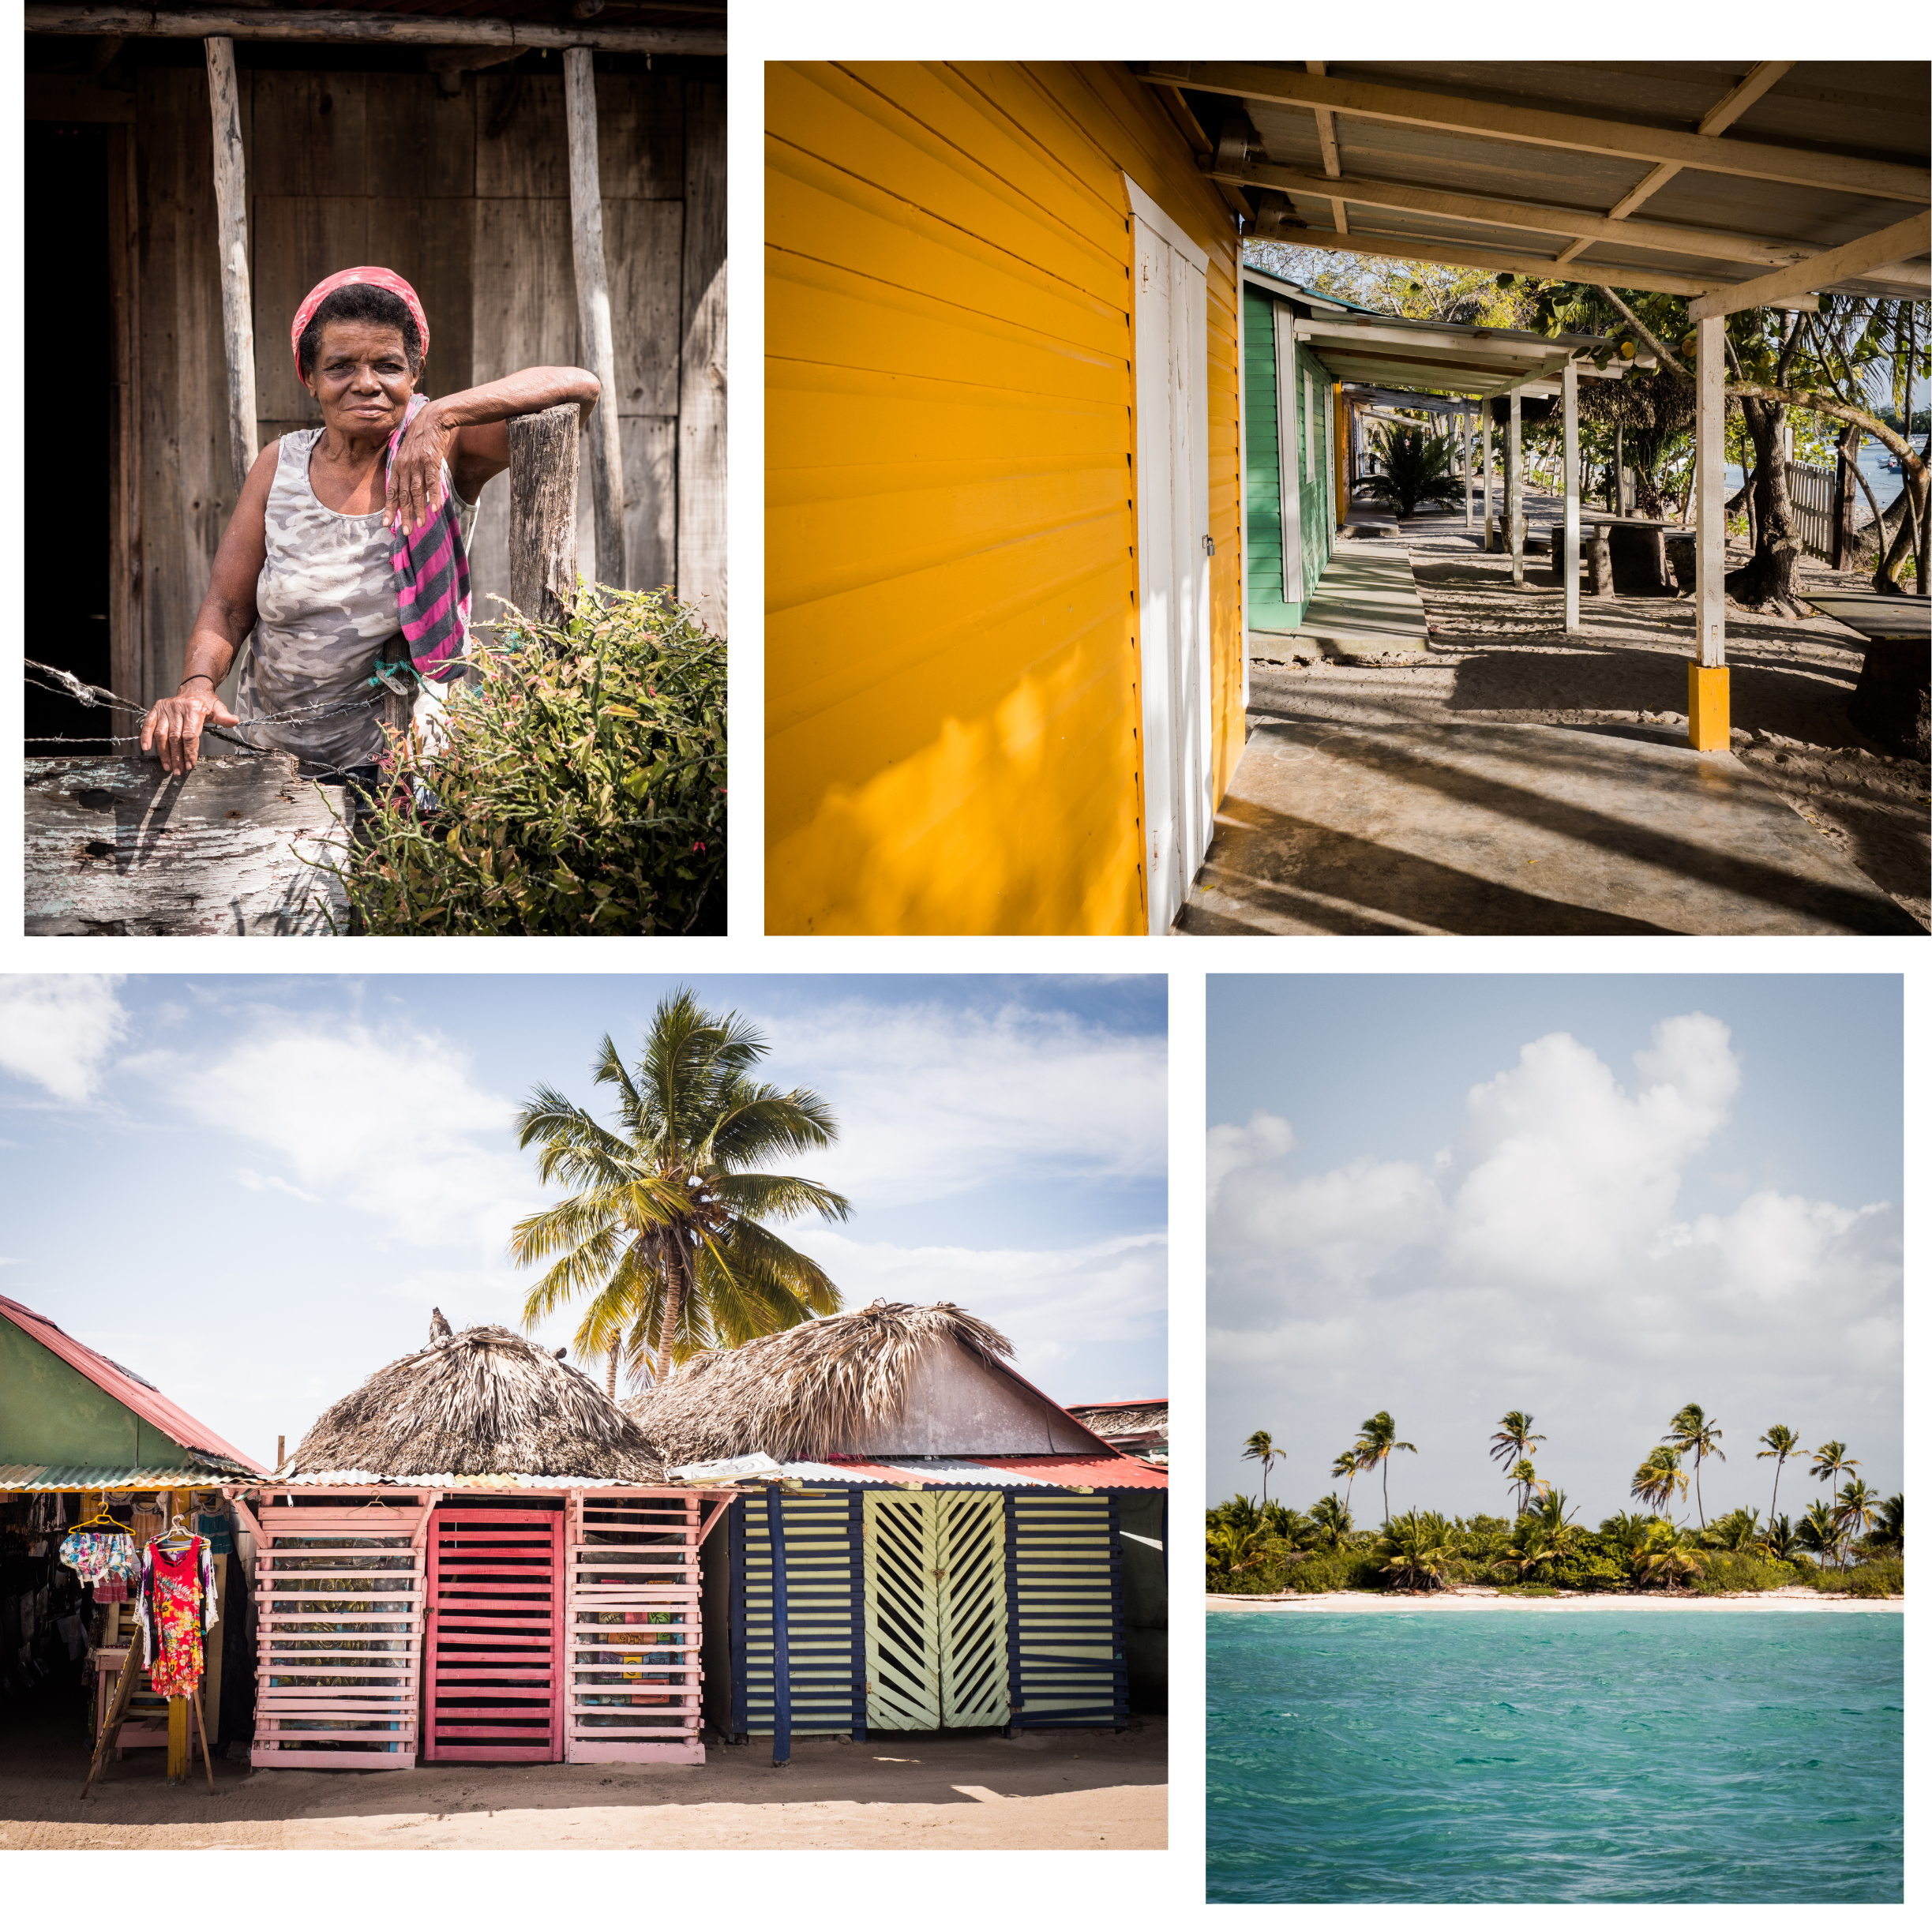 voyage caraibes-ile saona republique dominicaine-sejour bayahibe